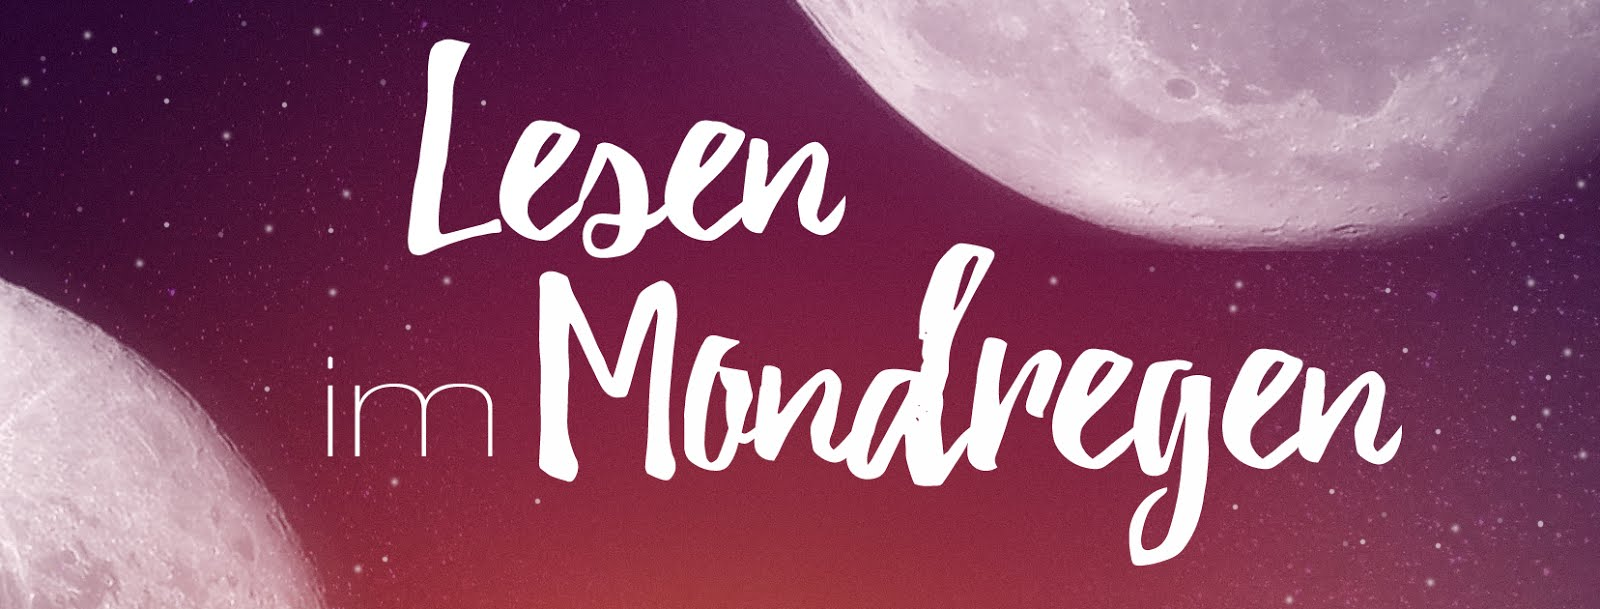 Lesen im Mondregen